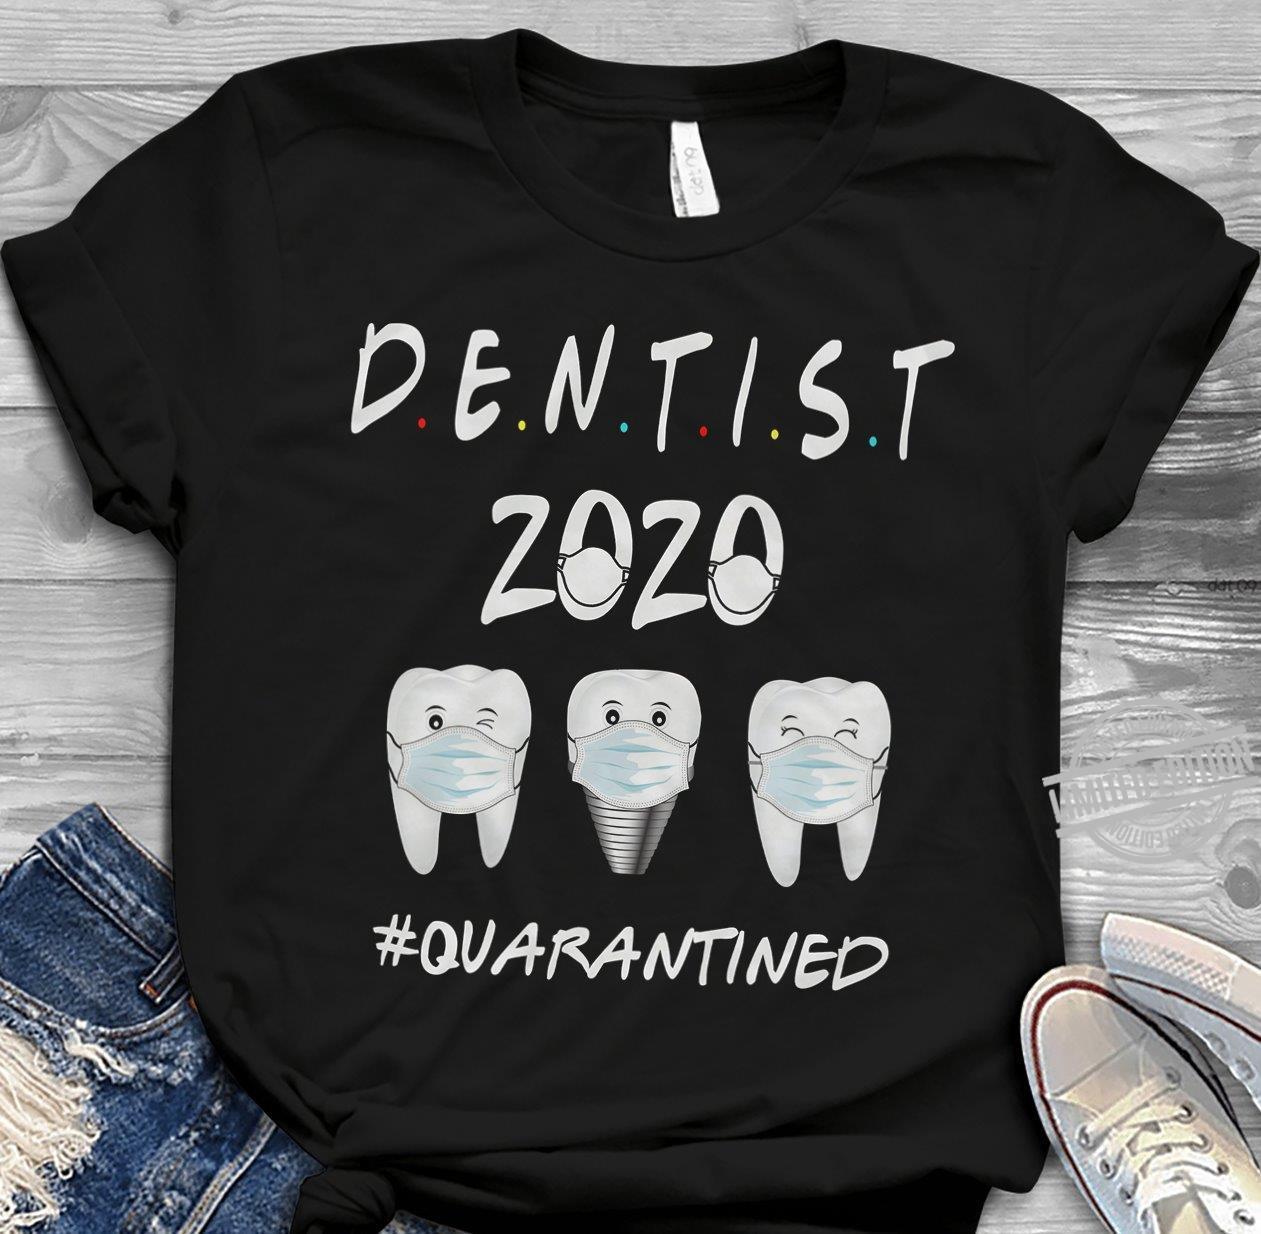 Dentist Zozo Quarantined Shirt